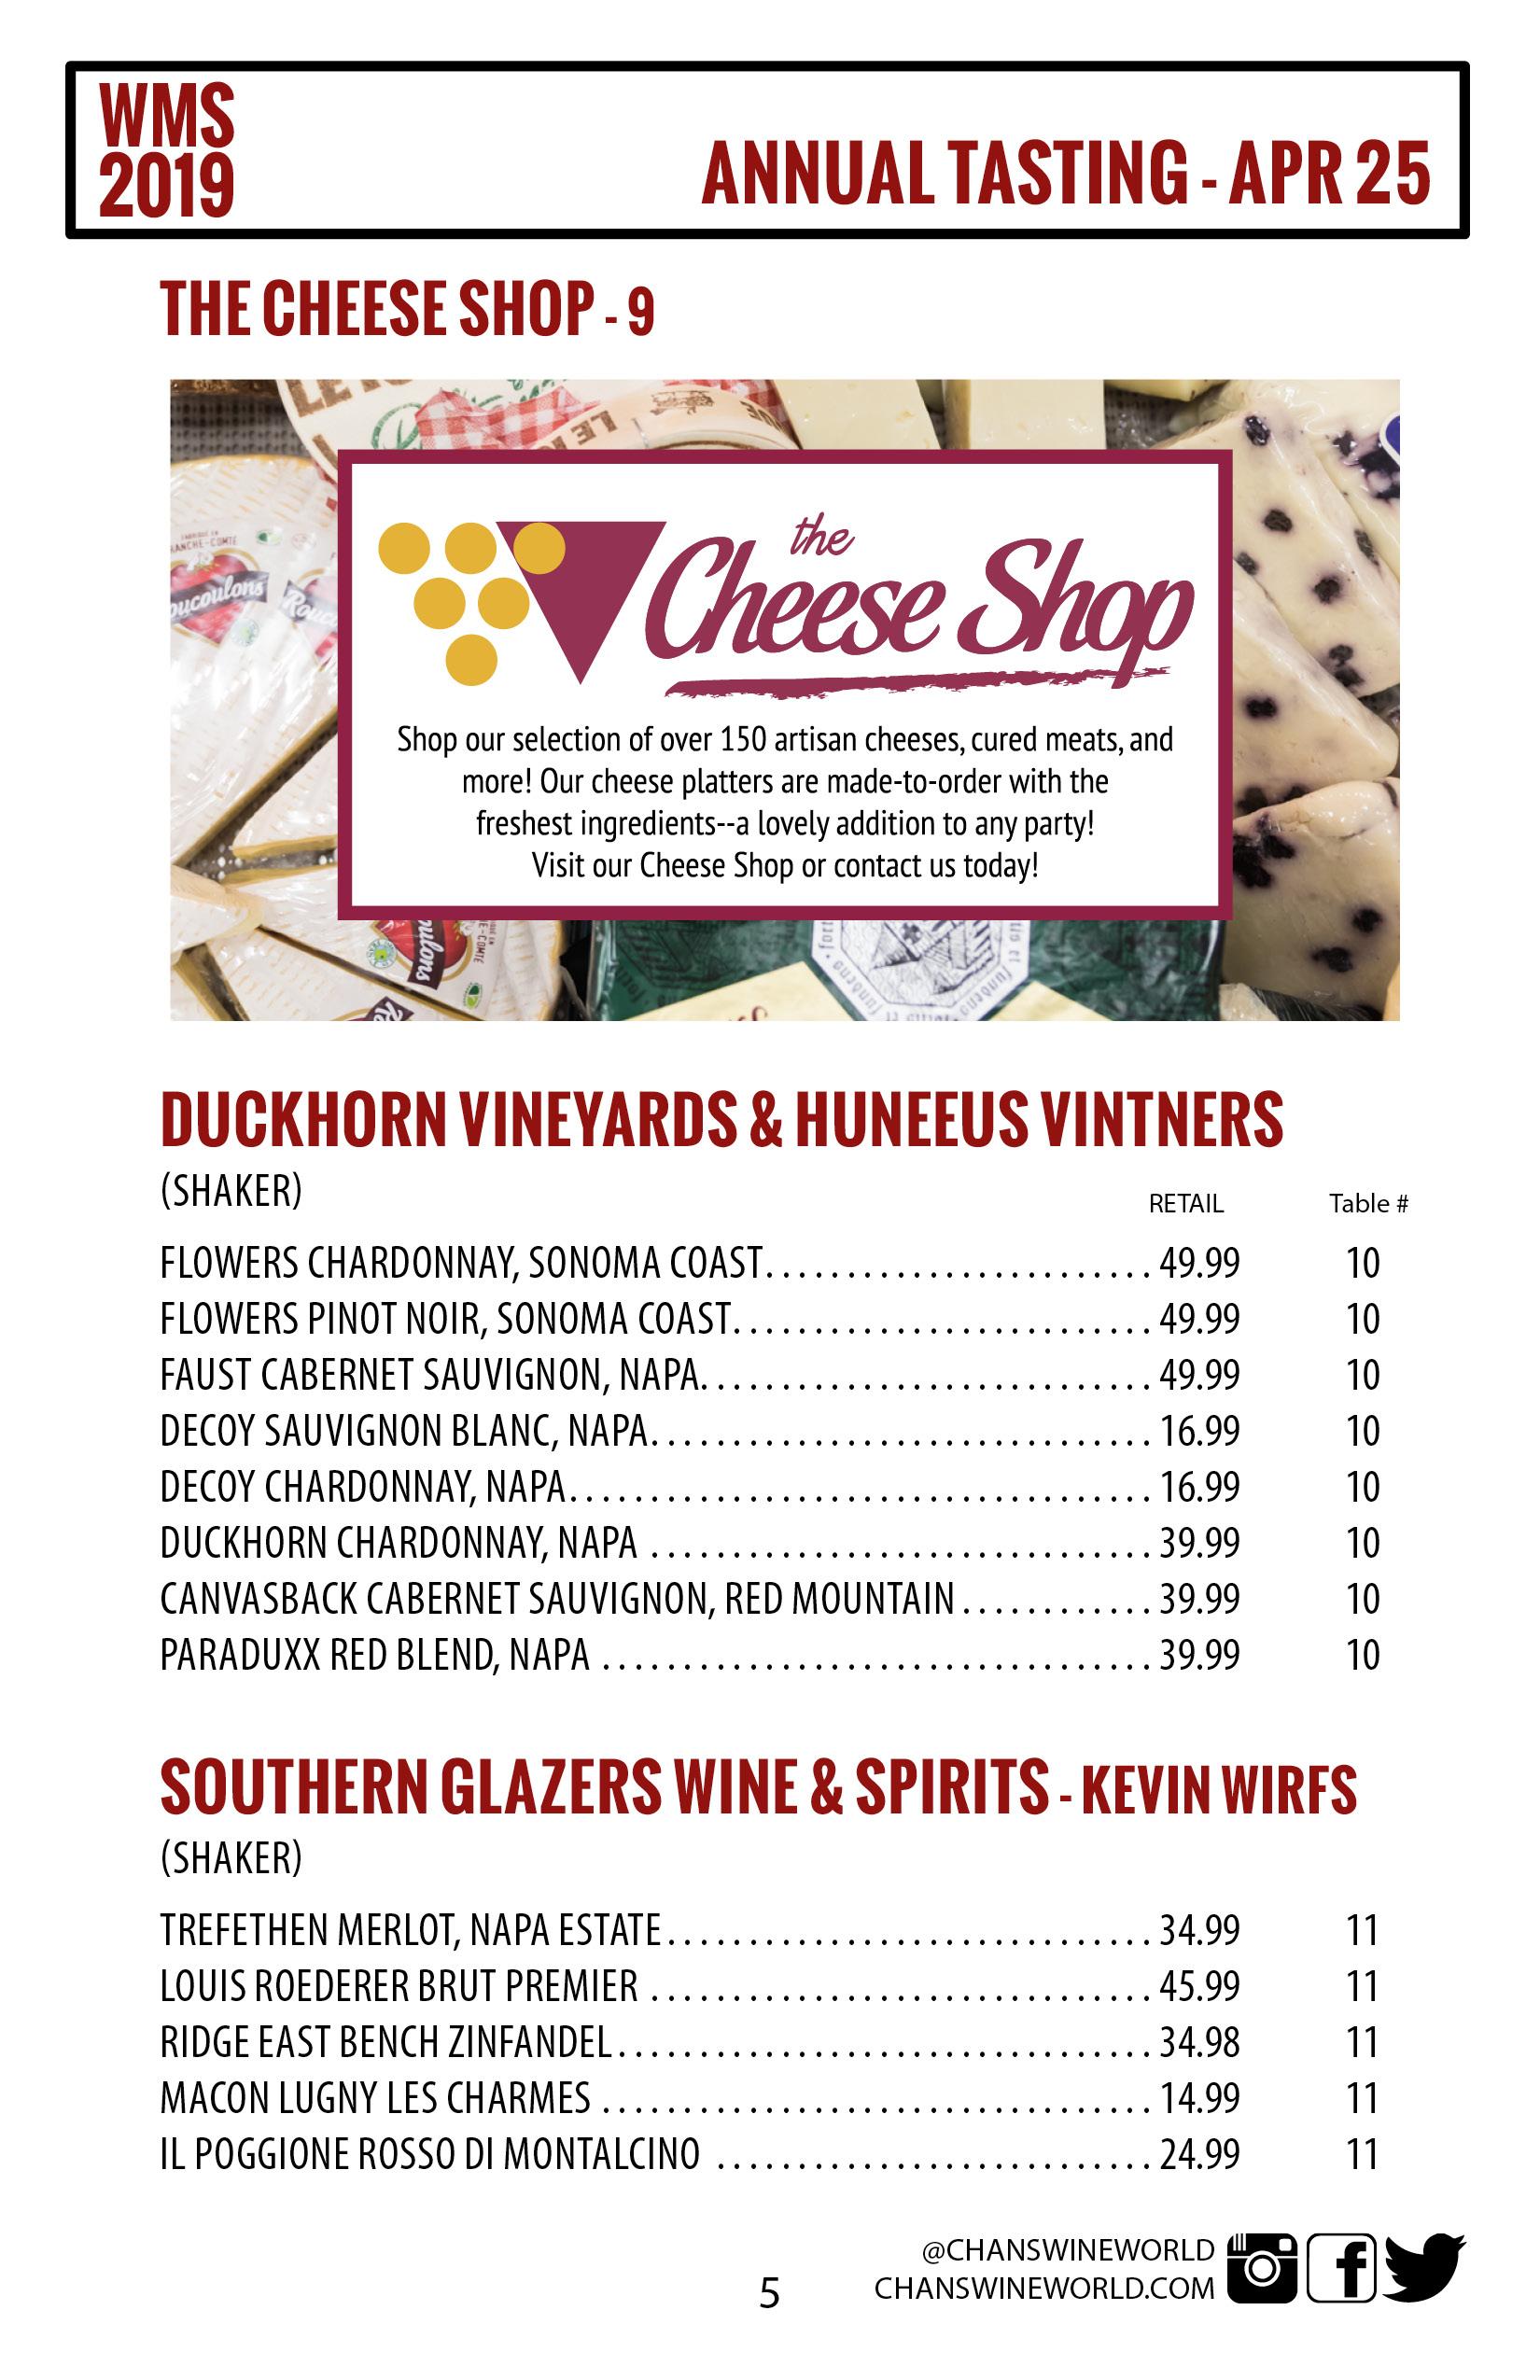 Winemakers and Shakers_Tasting Guide_20195.jpg